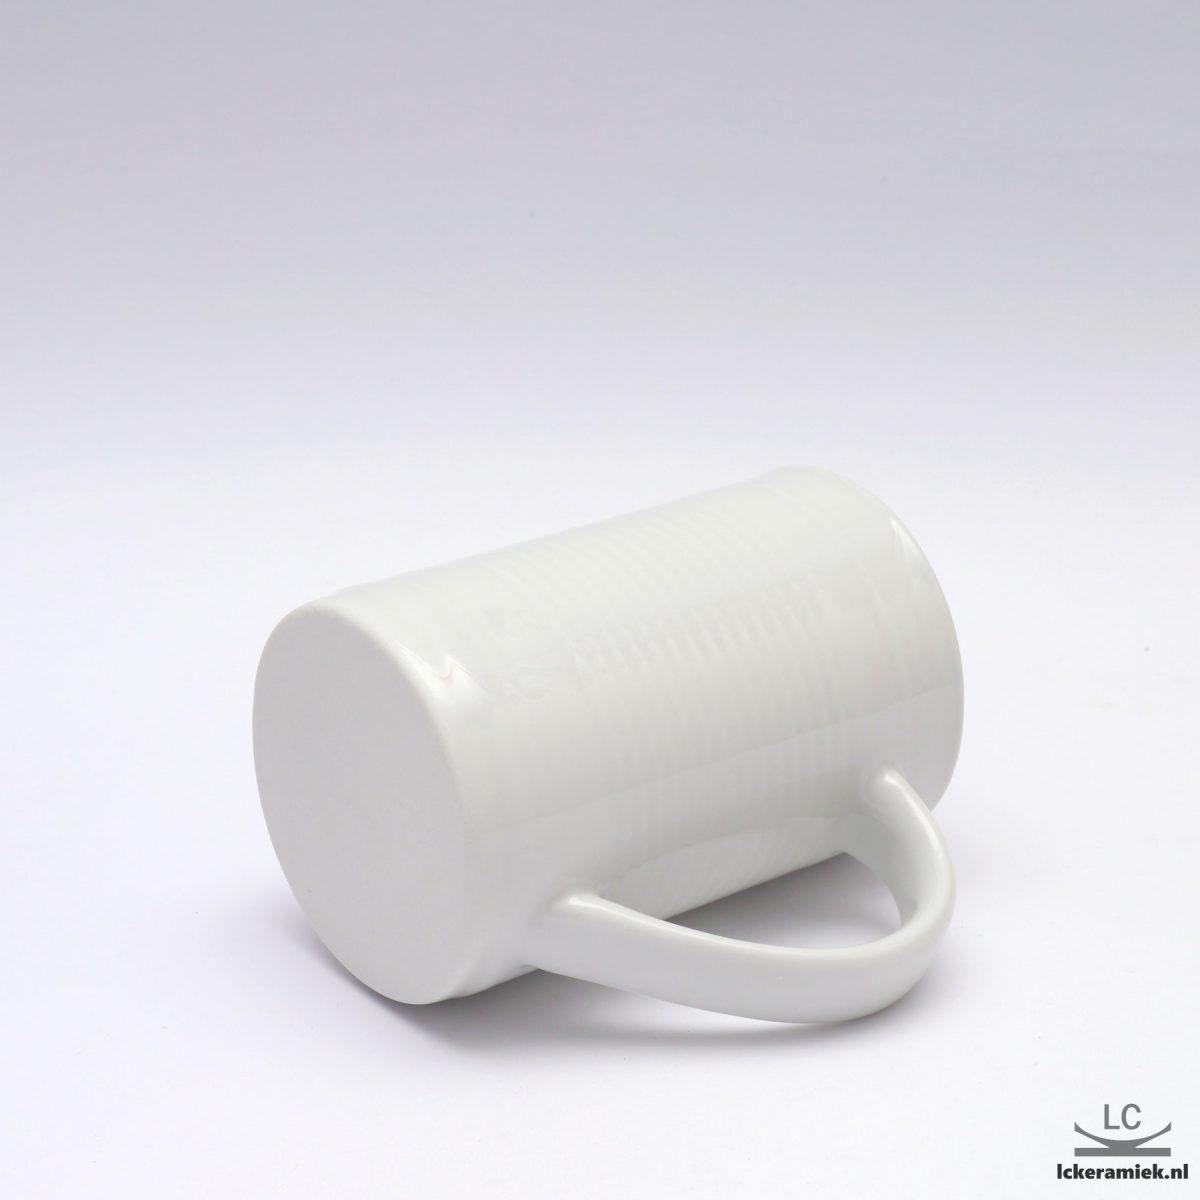 blikbeker van porselein wit